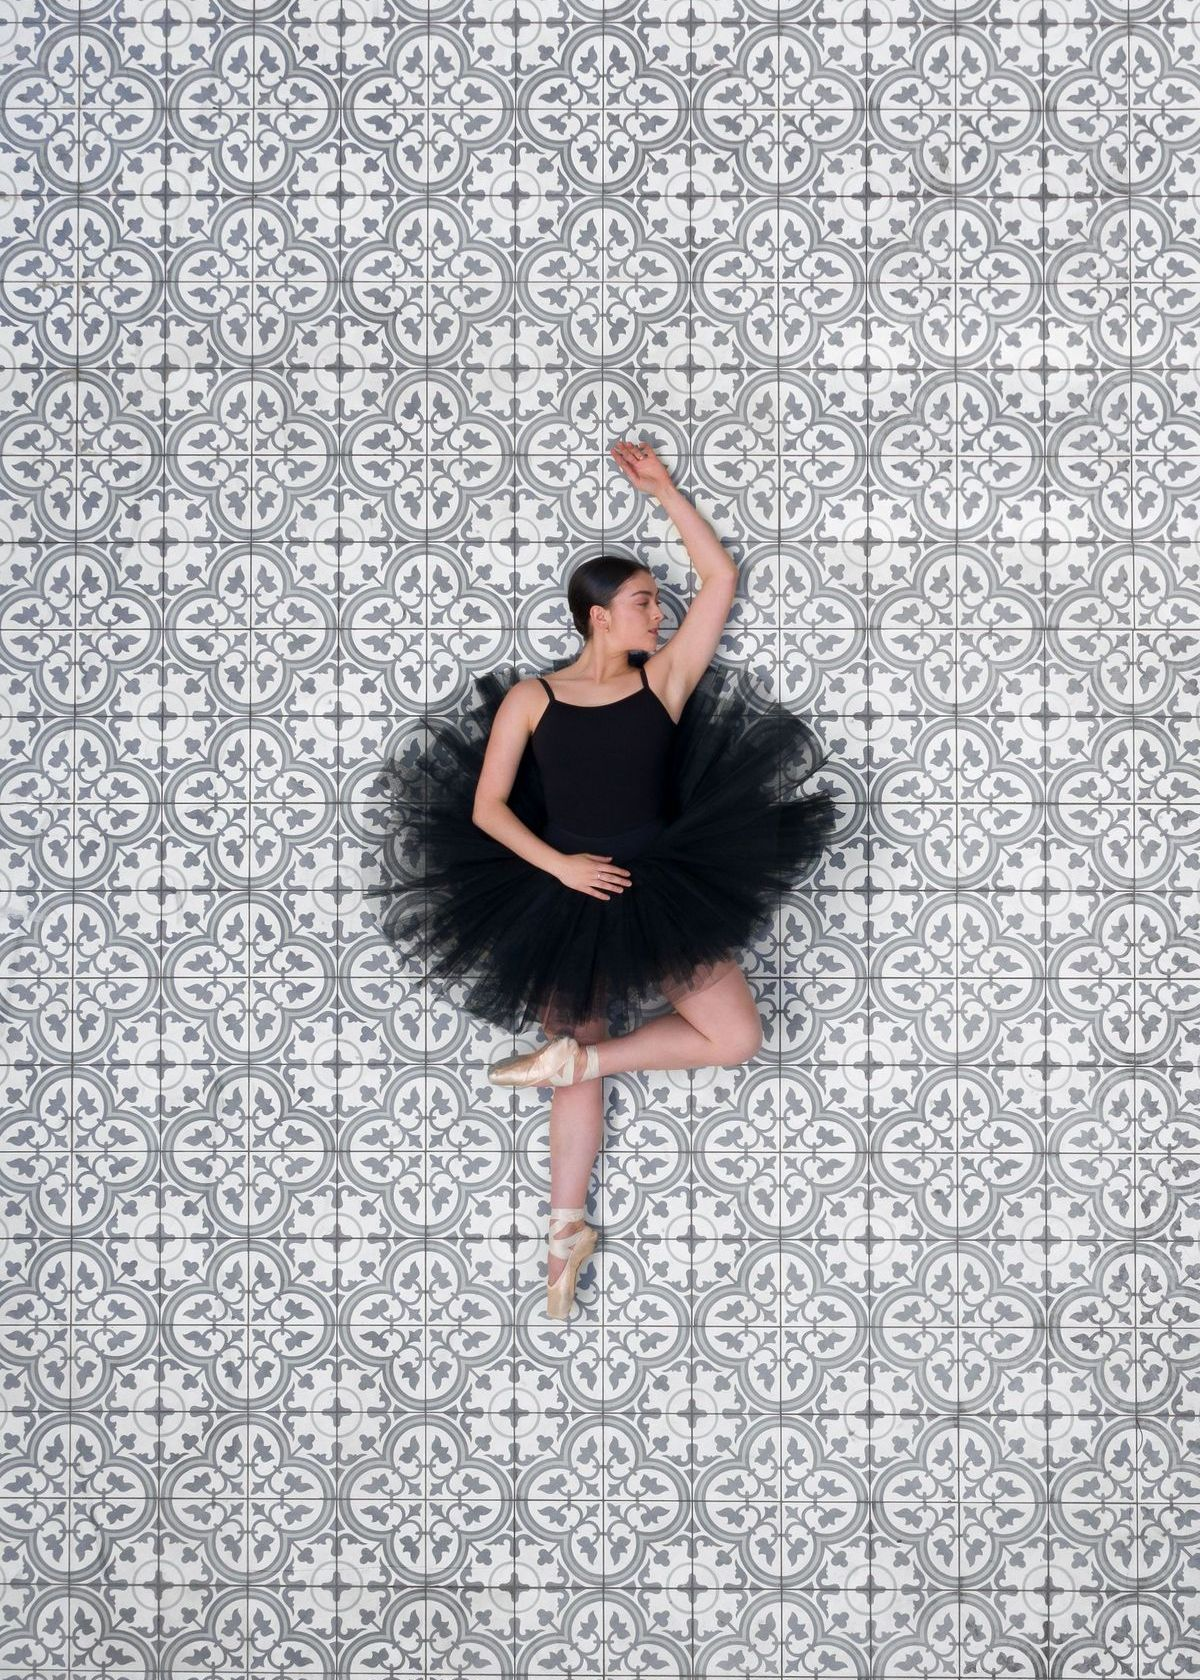 Ballerine de l'air: Brad Walls, Montana Rubin